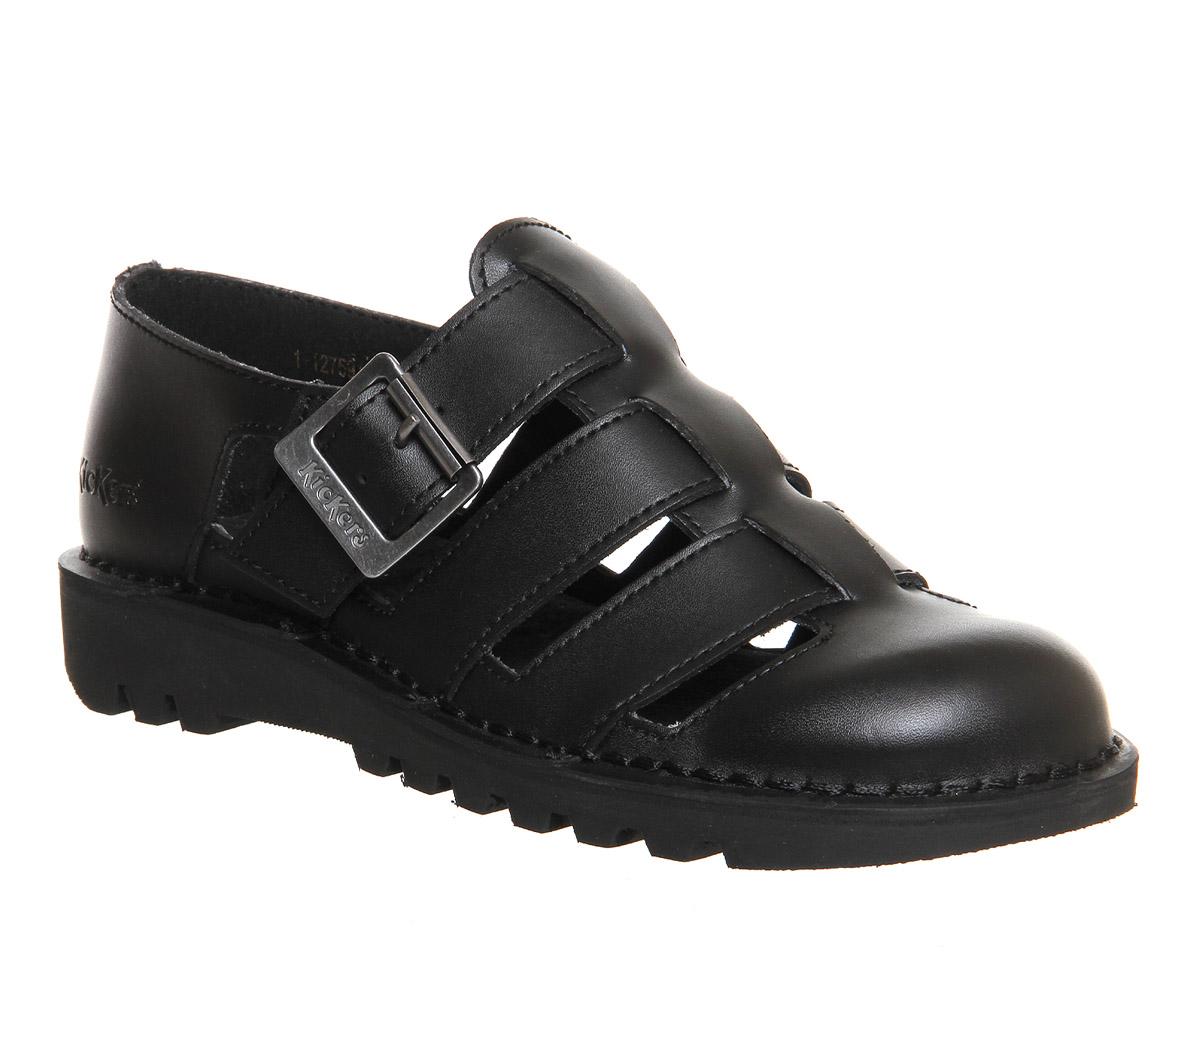 7882a6b7983 Womens-Kickers-Kick-Low-Weave-Black-Leather-Flats thumbnail